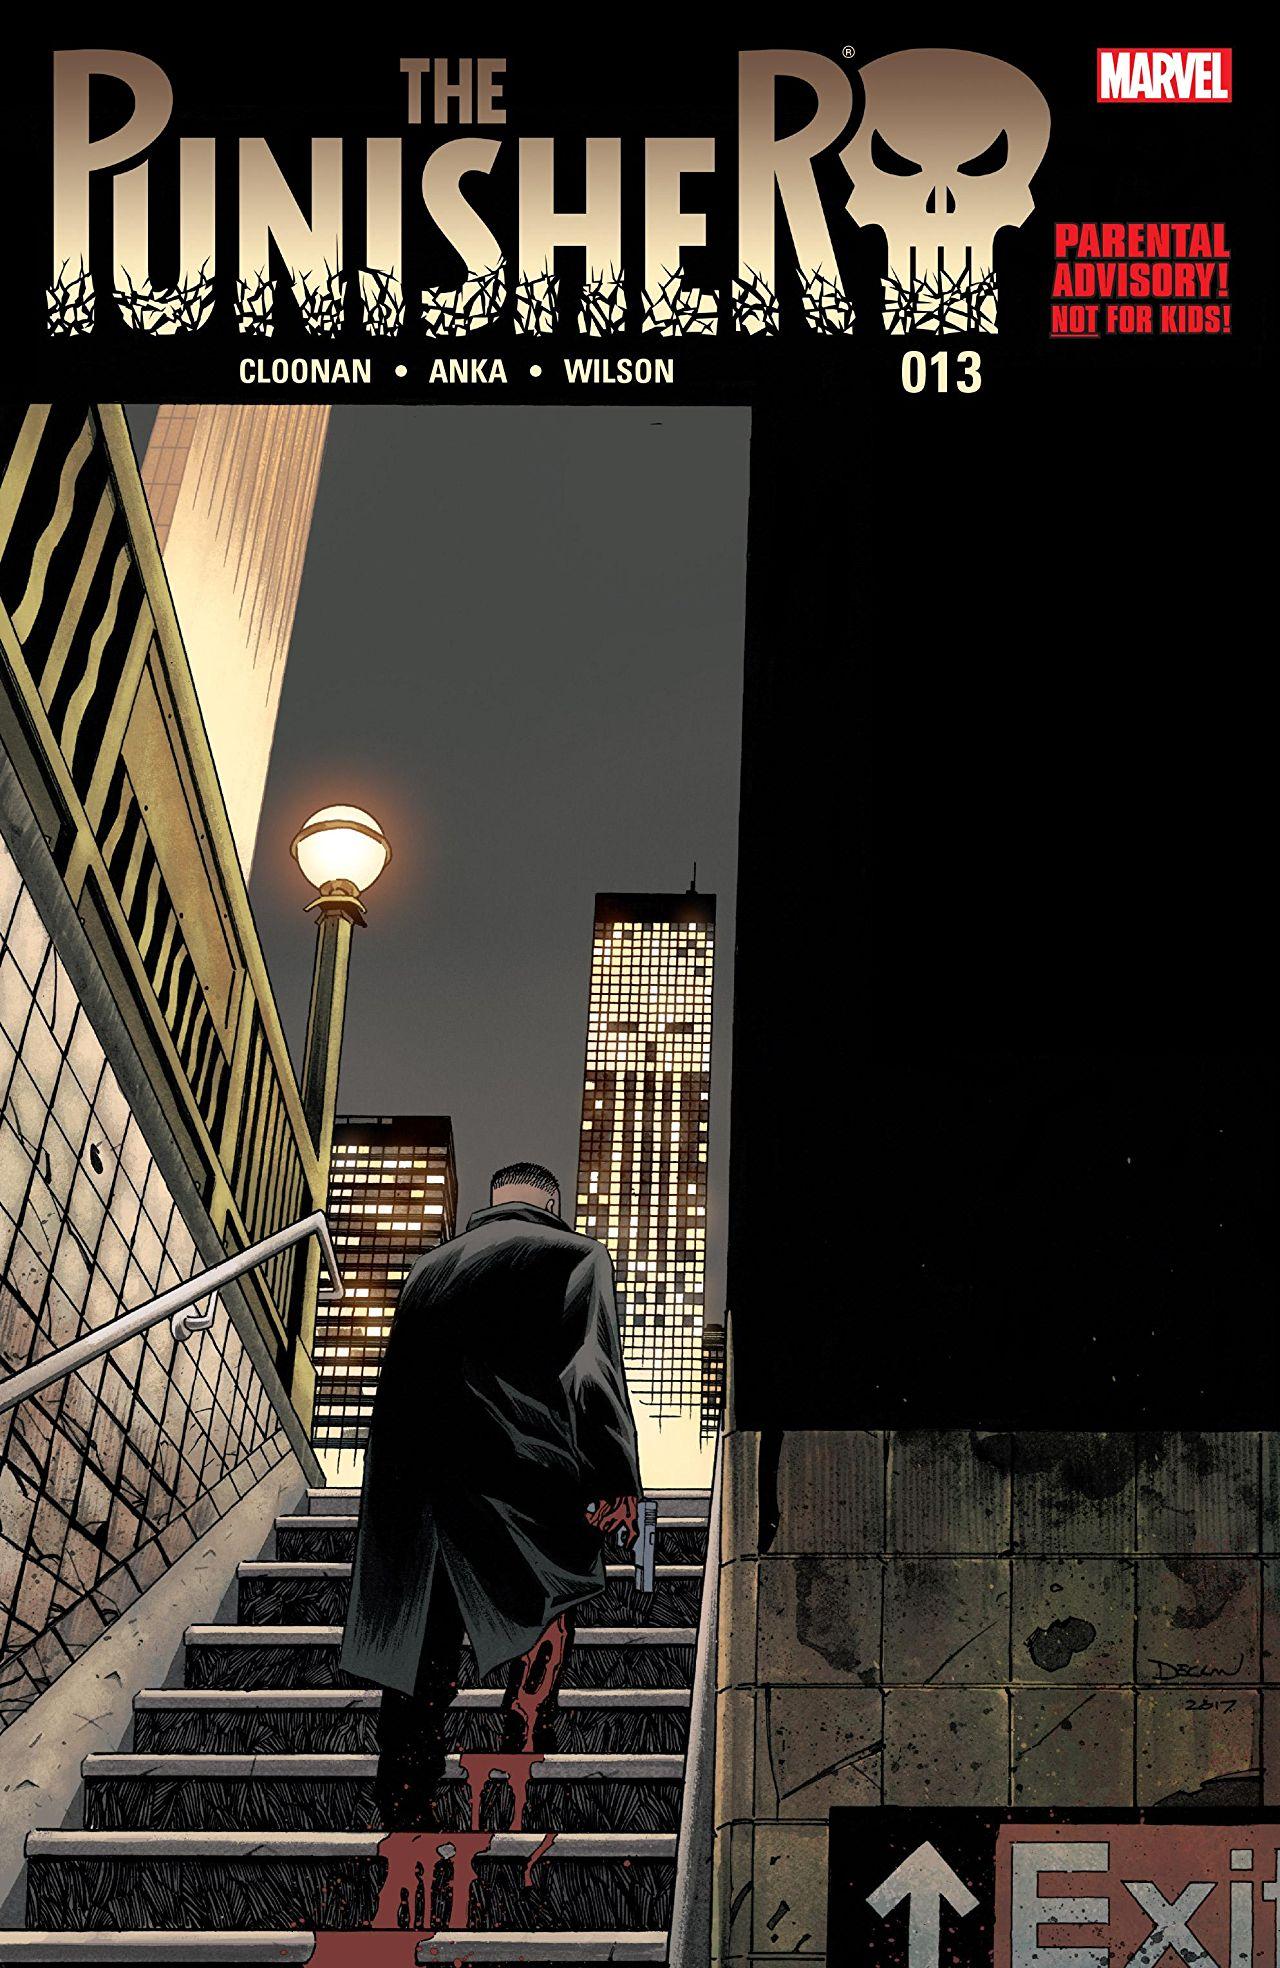 The Punisher #13, Marvel Comics